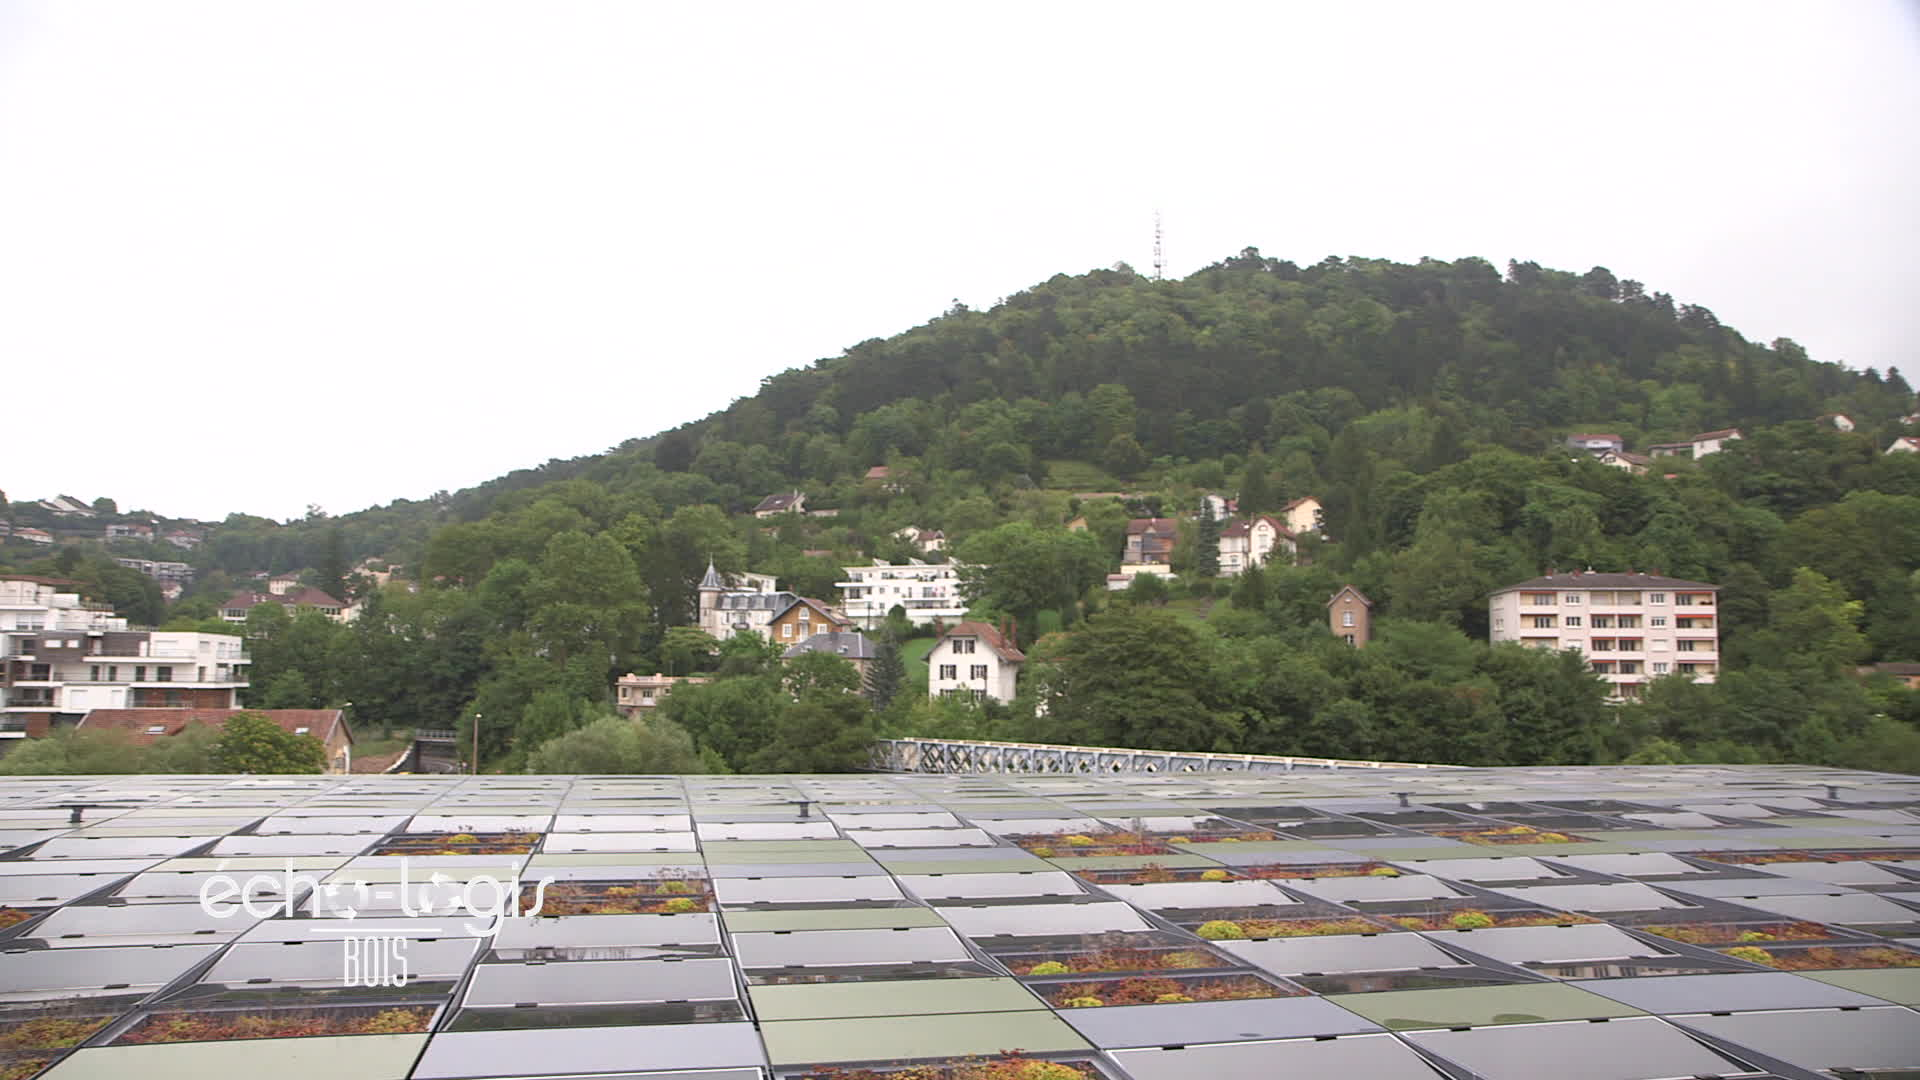 Bois à Besançon - France